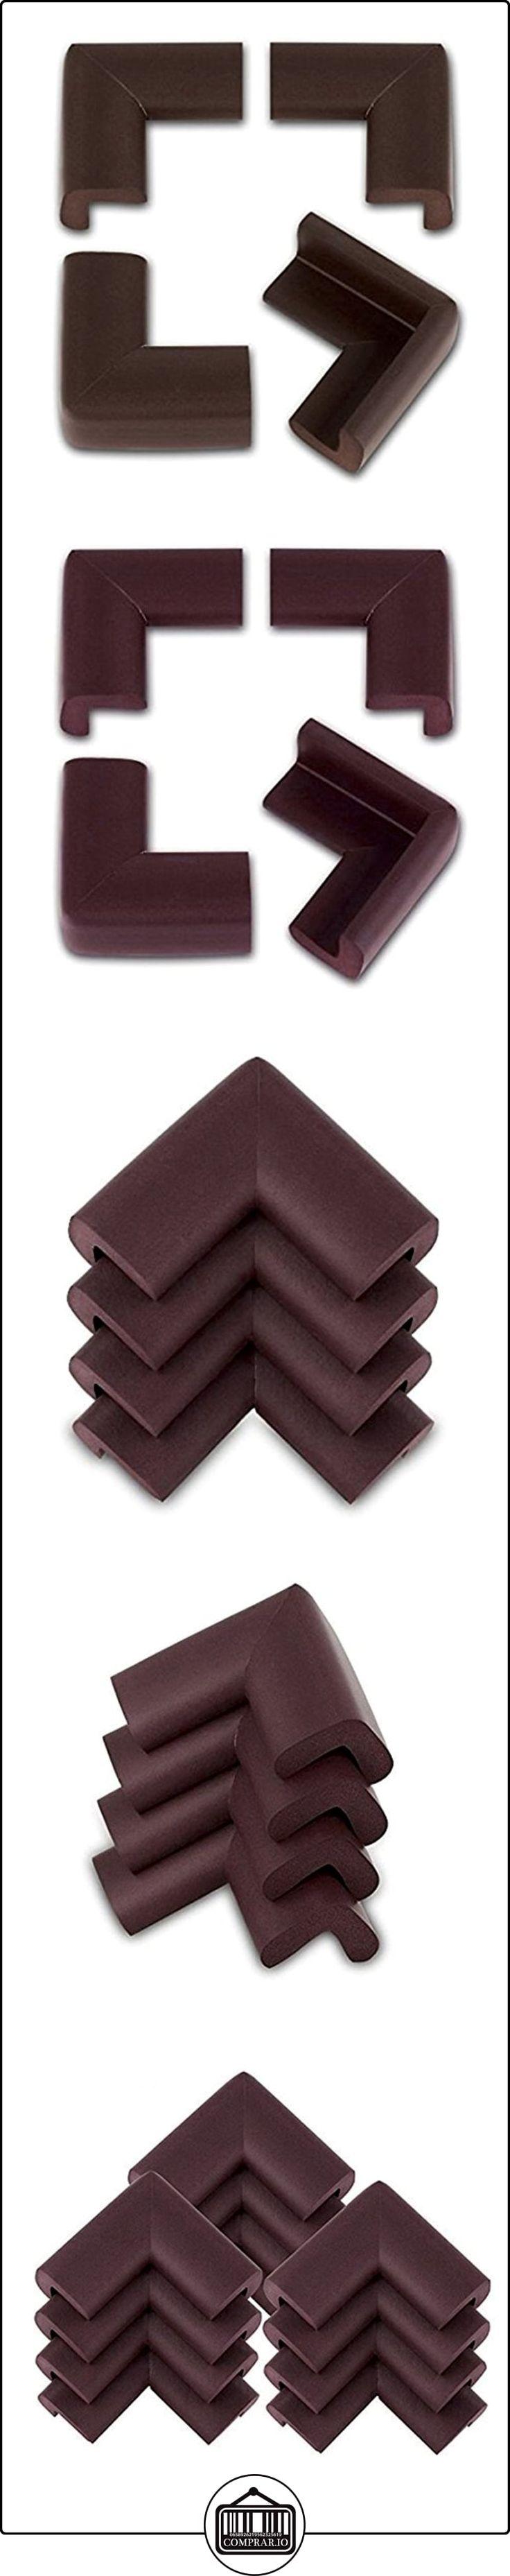 PIXNOR 12x mesa de seguridad Esquina cushions-desk protector-safe marrón para bebés niño  ✿ Seguridad para tu bebé - (Protege a tus hijos) ✿ ▬► Ver oferta: http://comprar.io/goto/B019C0JD2E